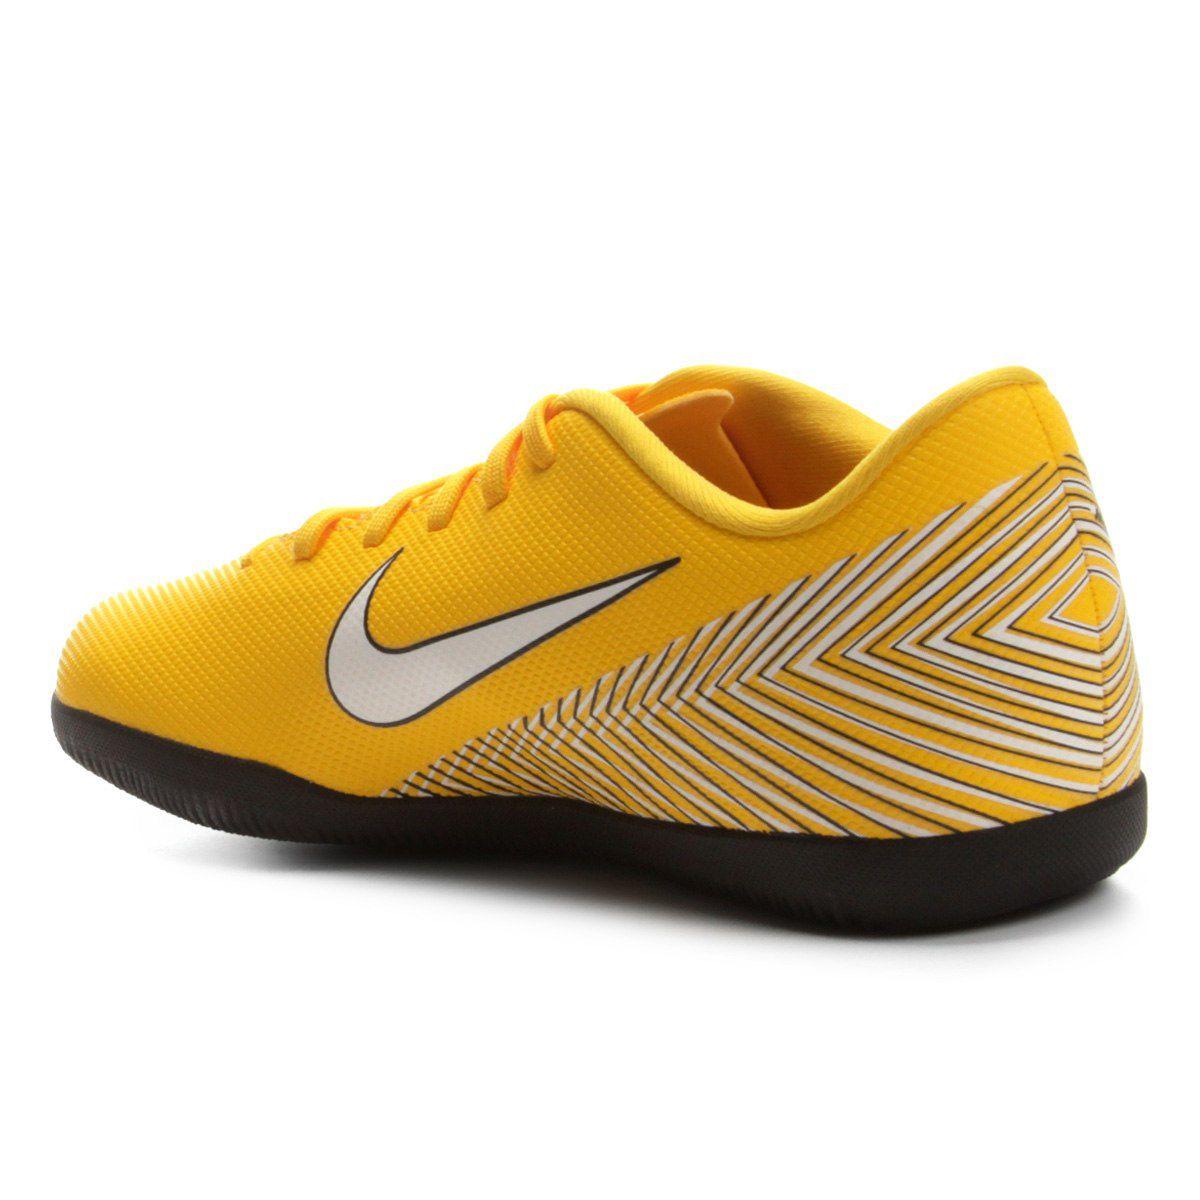 3f6b1daccdda9 Chuteira Futsal Nike Mercurial Vapor 12 Club Neymar IC INFANTIL - Amarelo e  Preto - Titanes Esportes